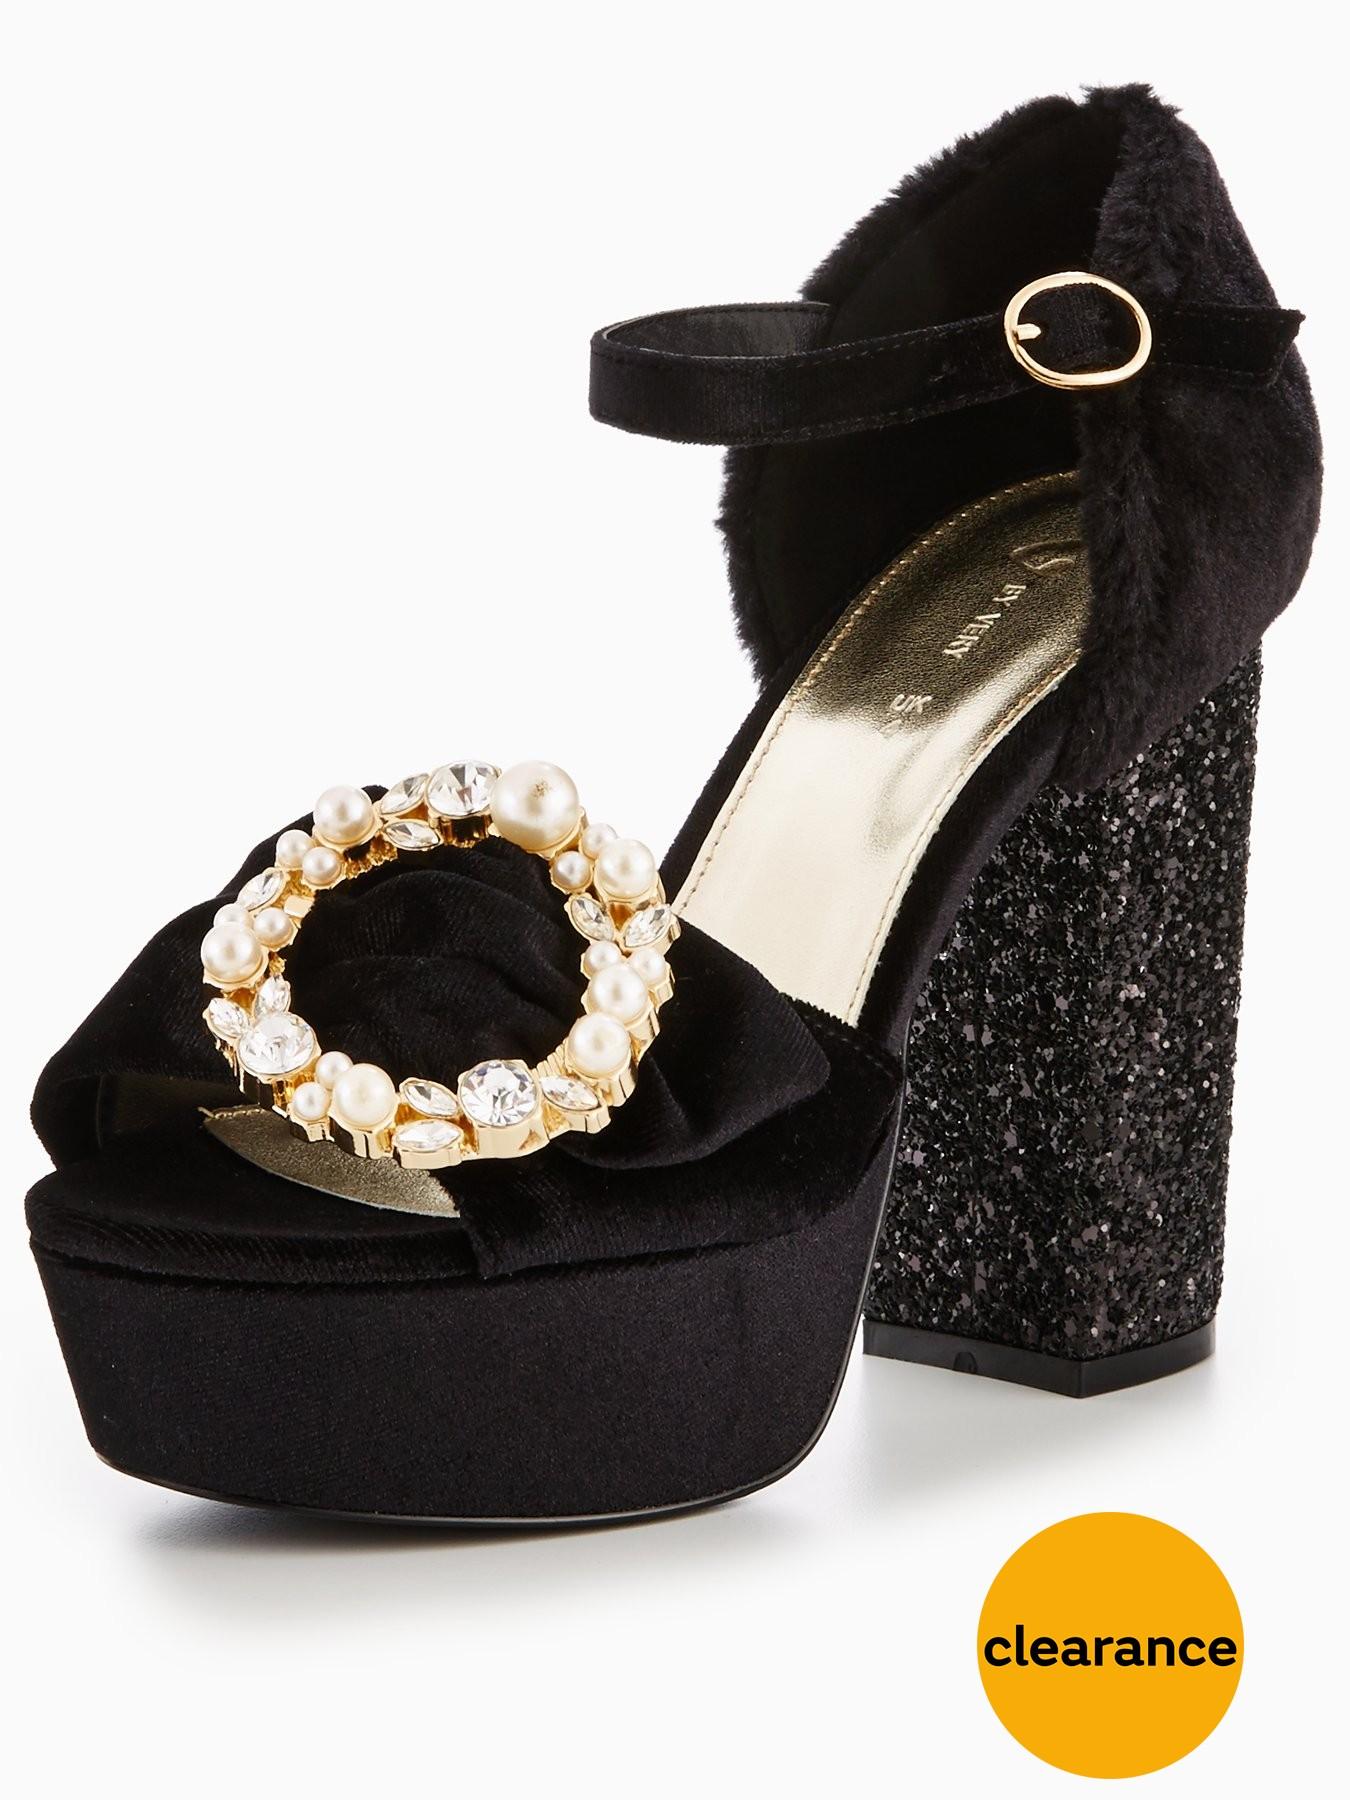 V by Very Nikita Glitter Heel Platform Sandal Black 1600200751 Women's Shoes V by Very Heels